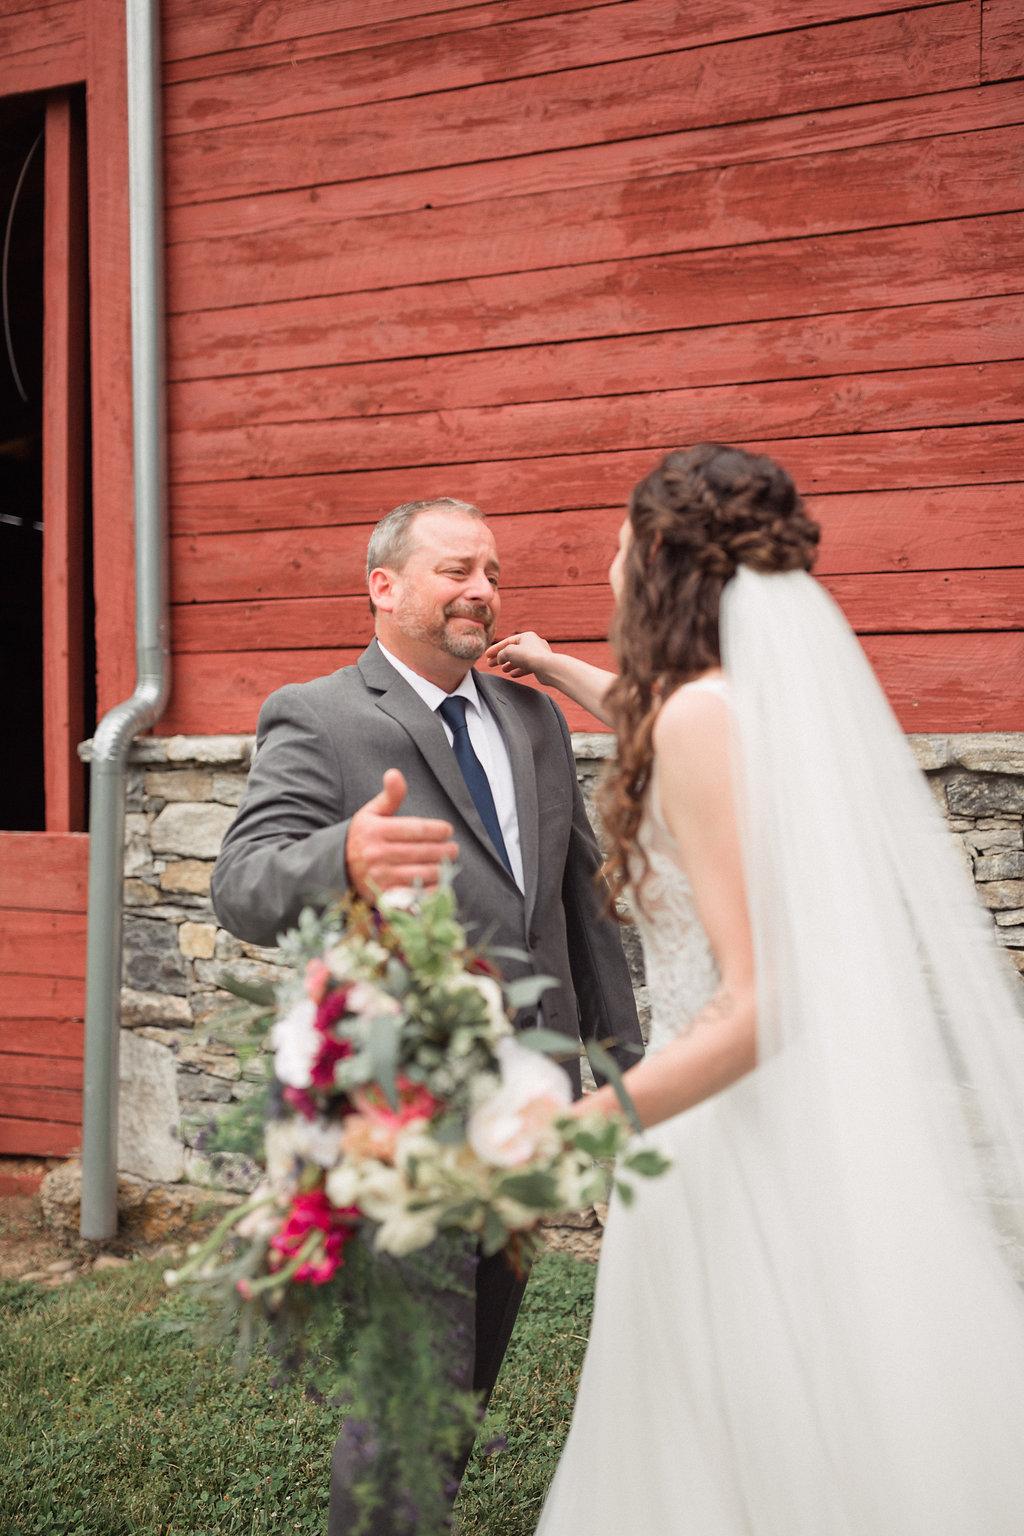 Honeysuckle-Hill-Weddings-Mallory-Patrick-44.jpg